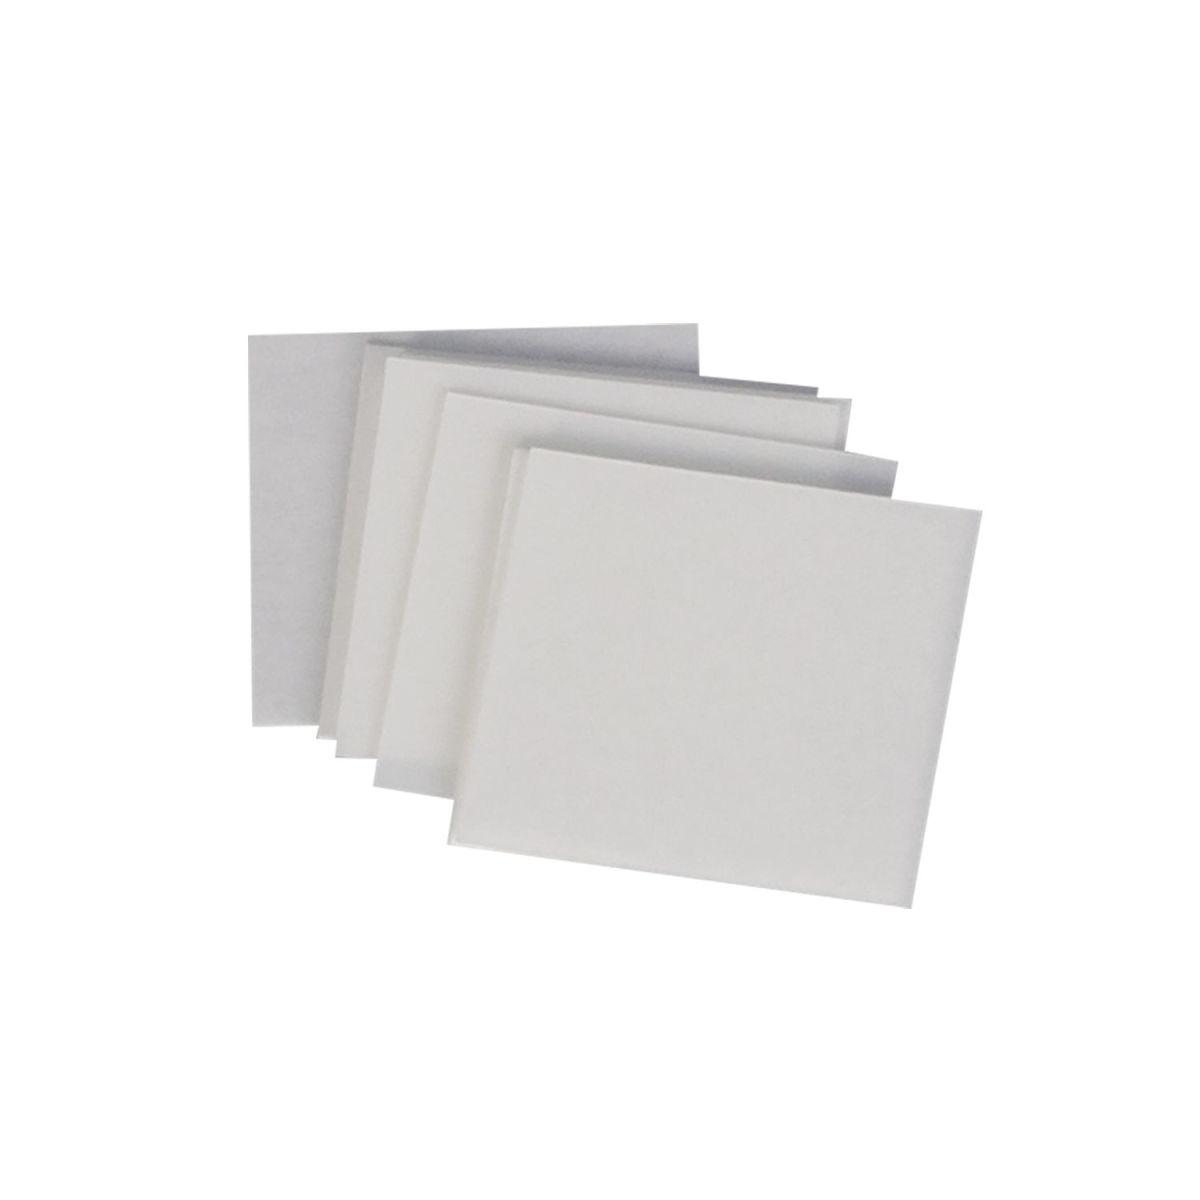 Anti-Microbial Film - 1 x 1 (10 pack)